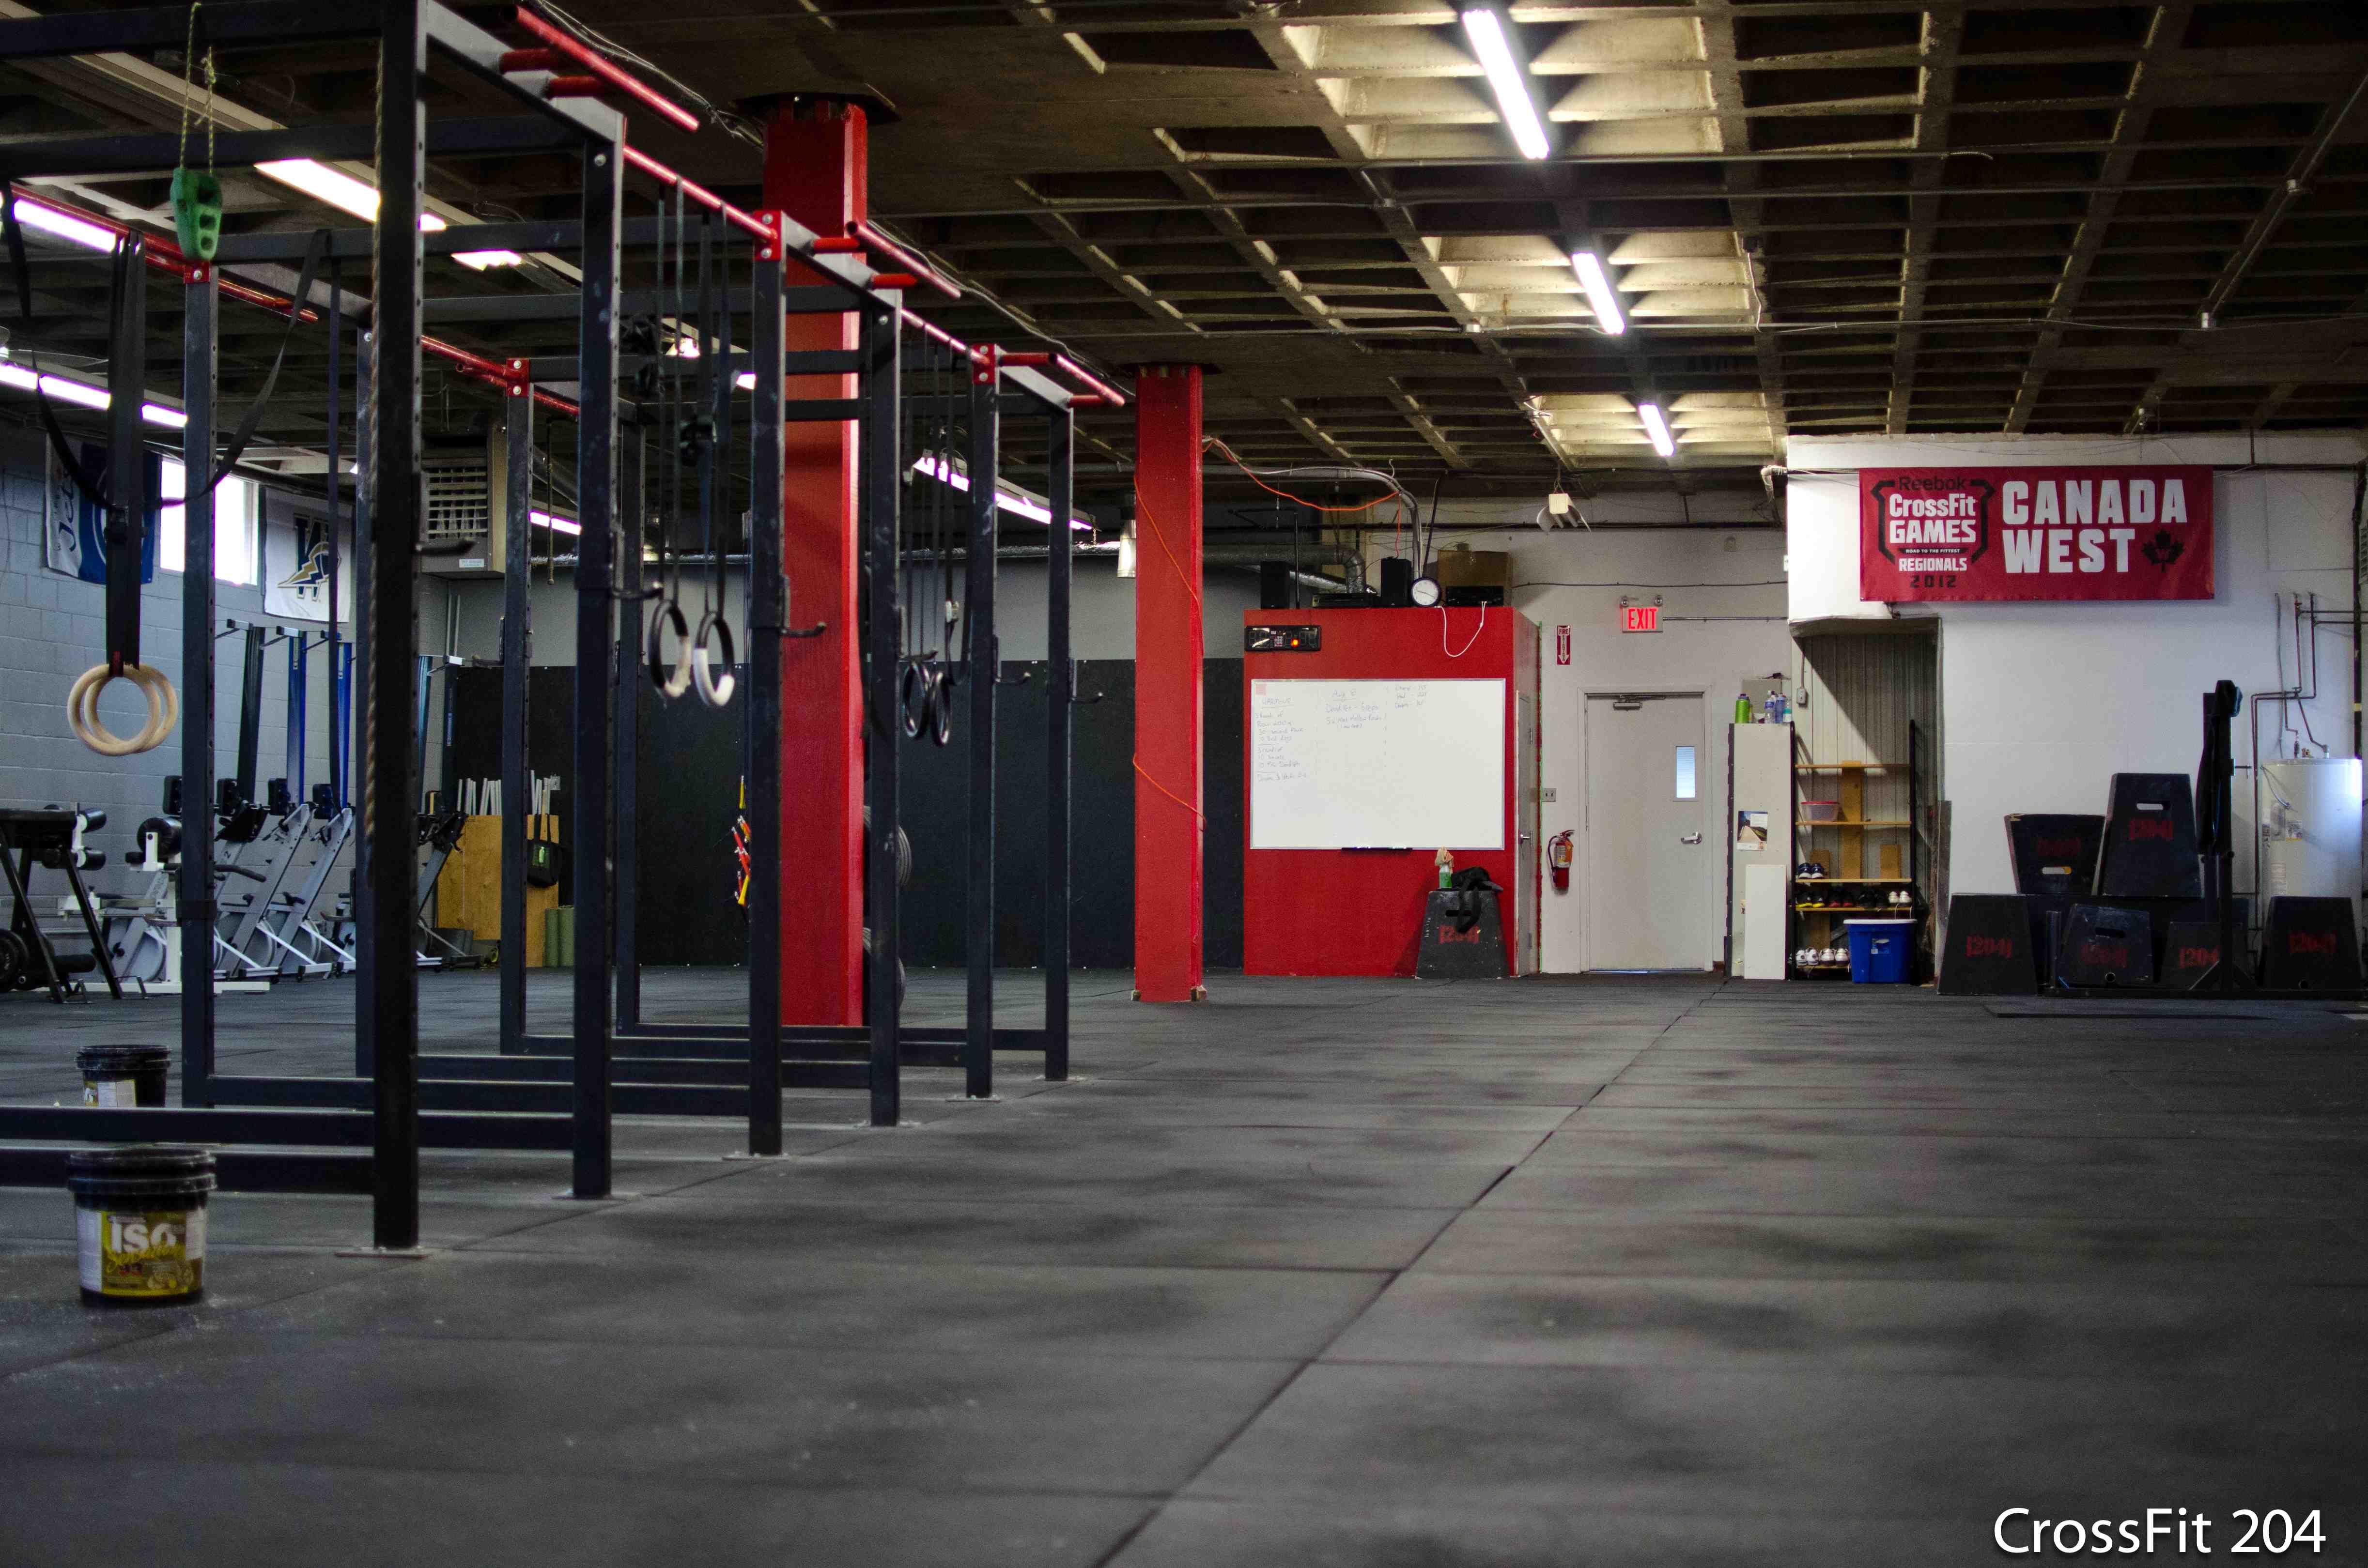 Crossfit Space And Frame Gym Design Warehouse Gym Gym Interior